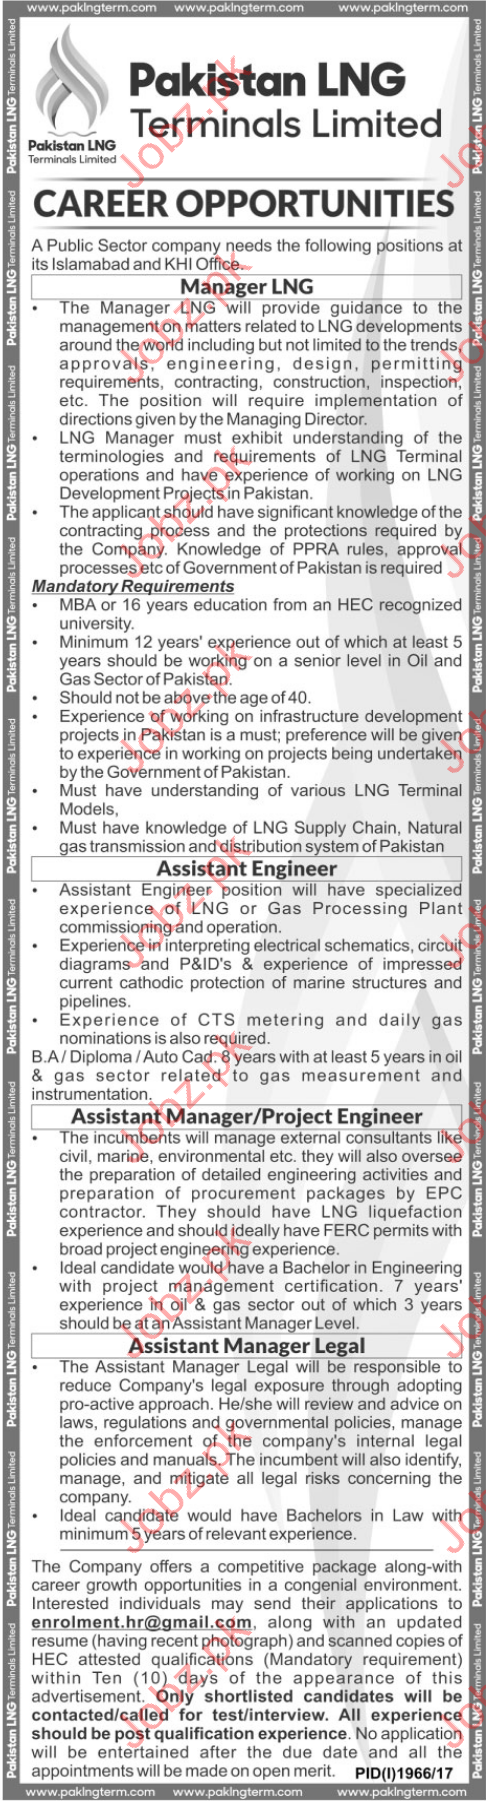 Pakistan LNG Terminals Ltd Career Opportunities